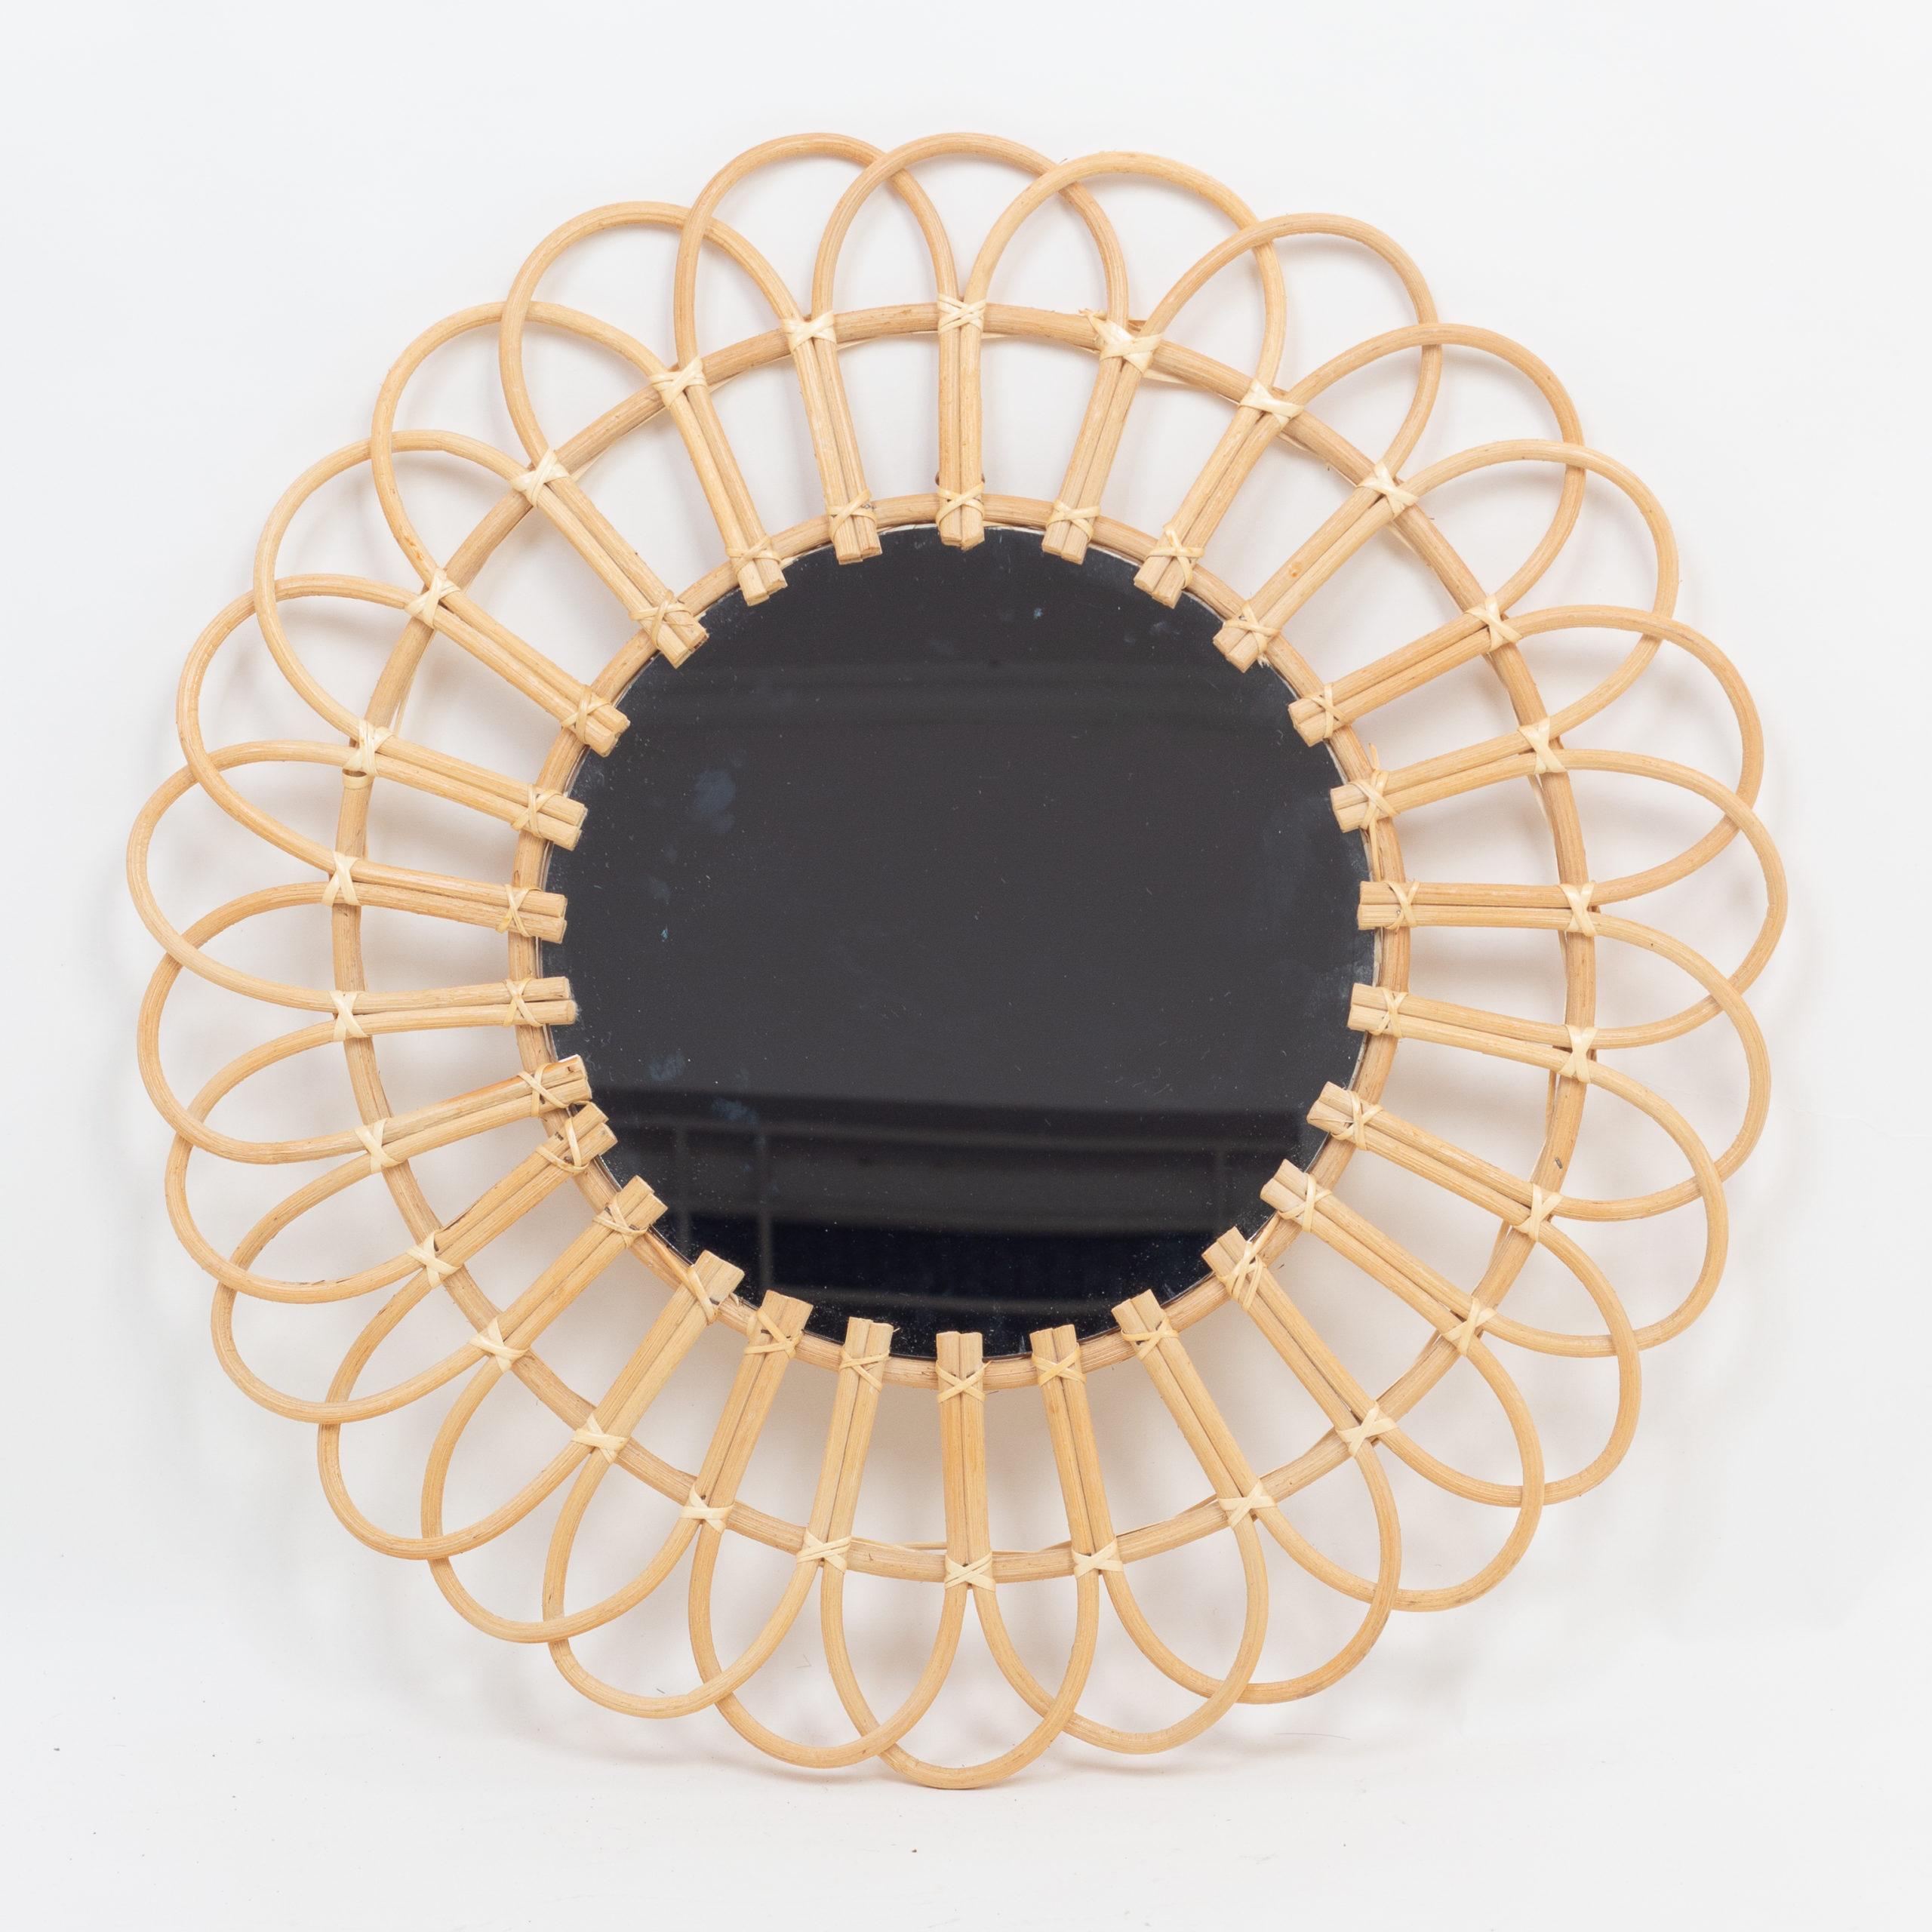 Round rattan decorative mirrors decor wall from Vietnam manufacturer